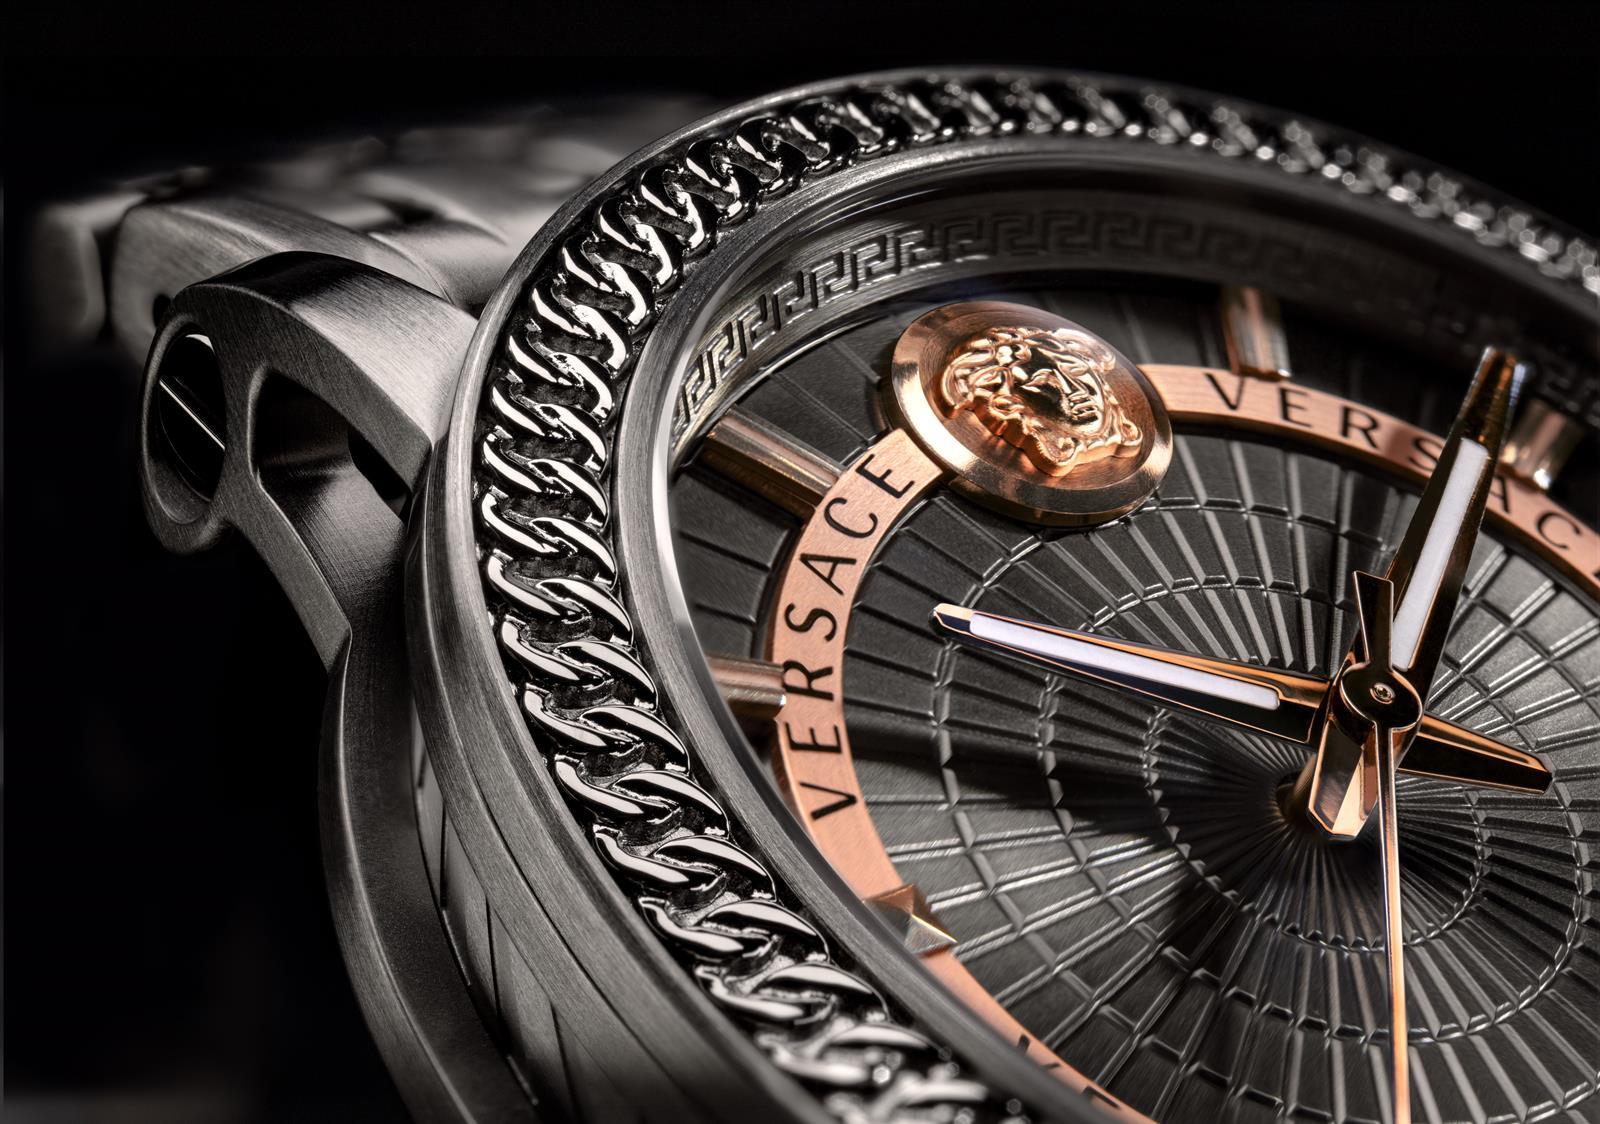 nuovo orologio versace